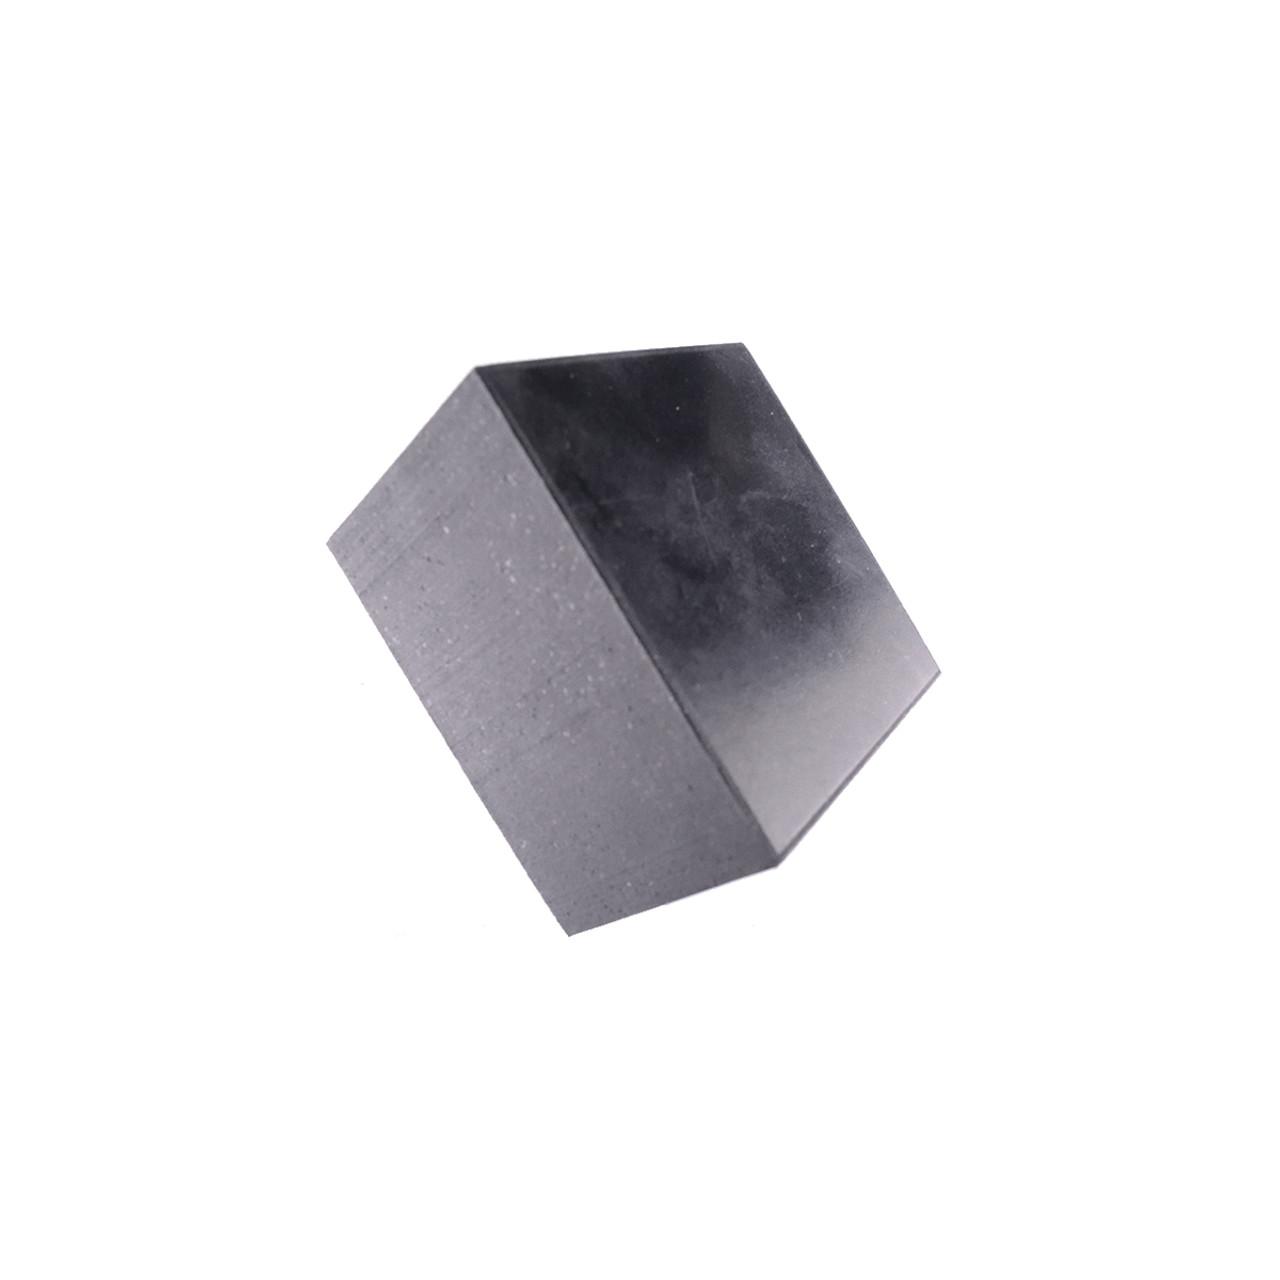 Rubber Block - Small Flat